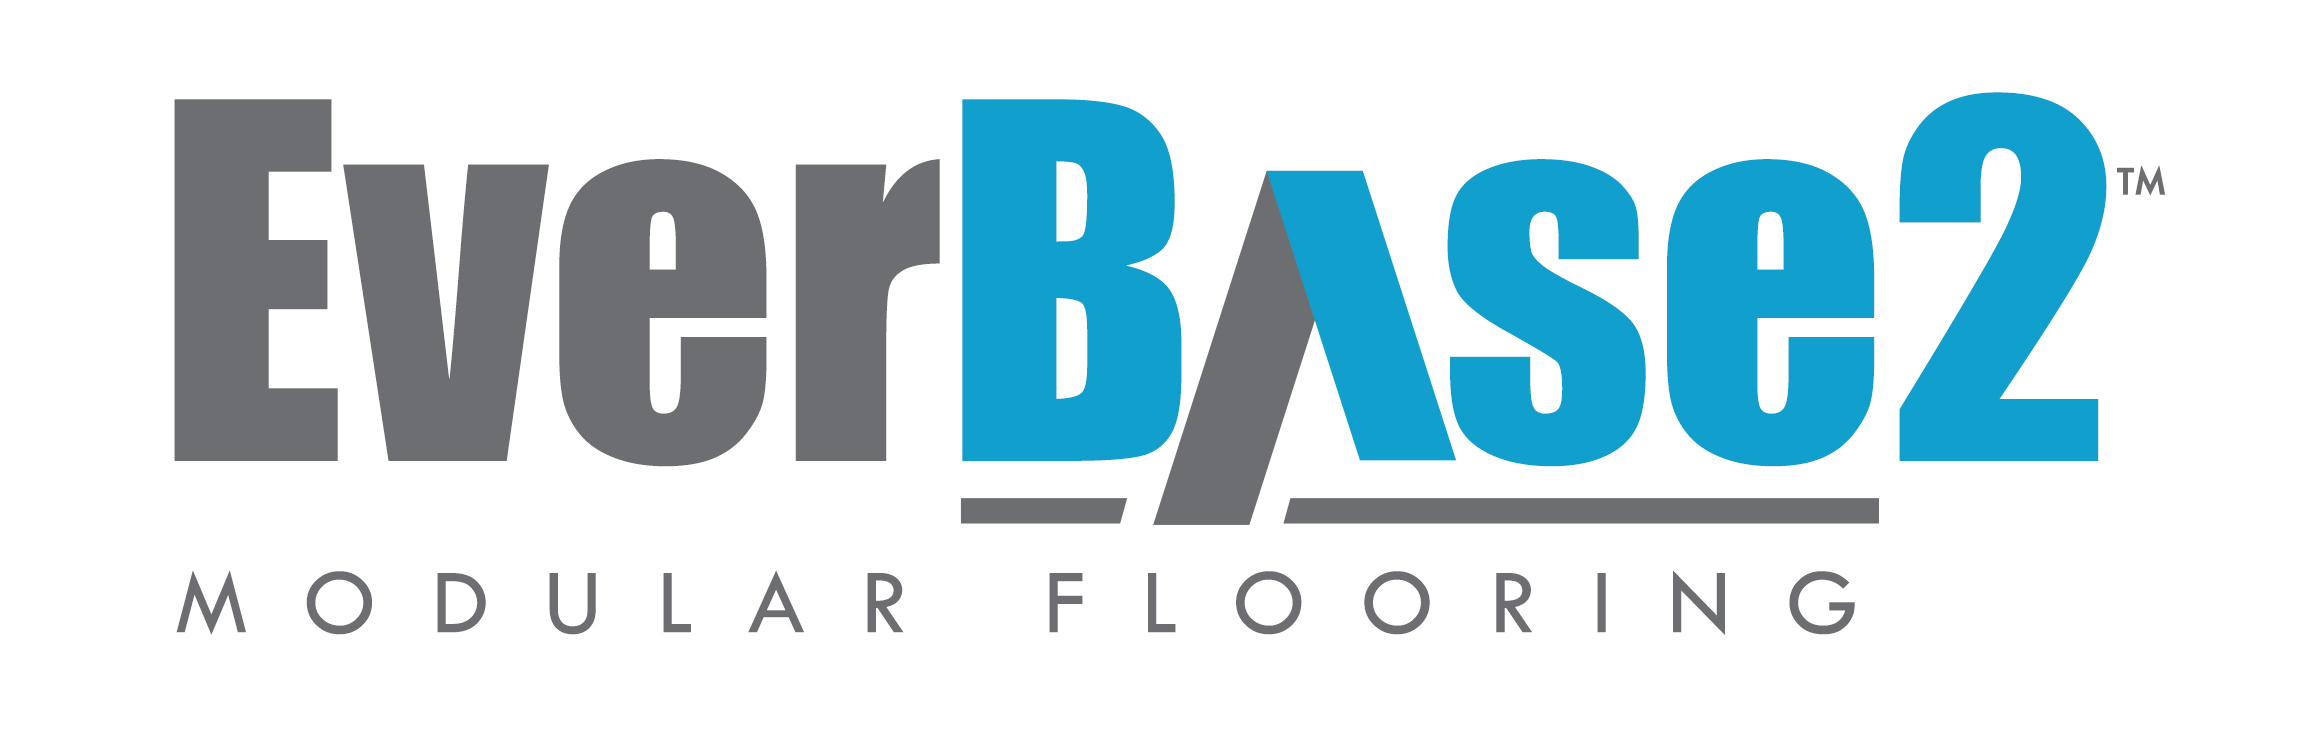 everbase 2 modular flooring system